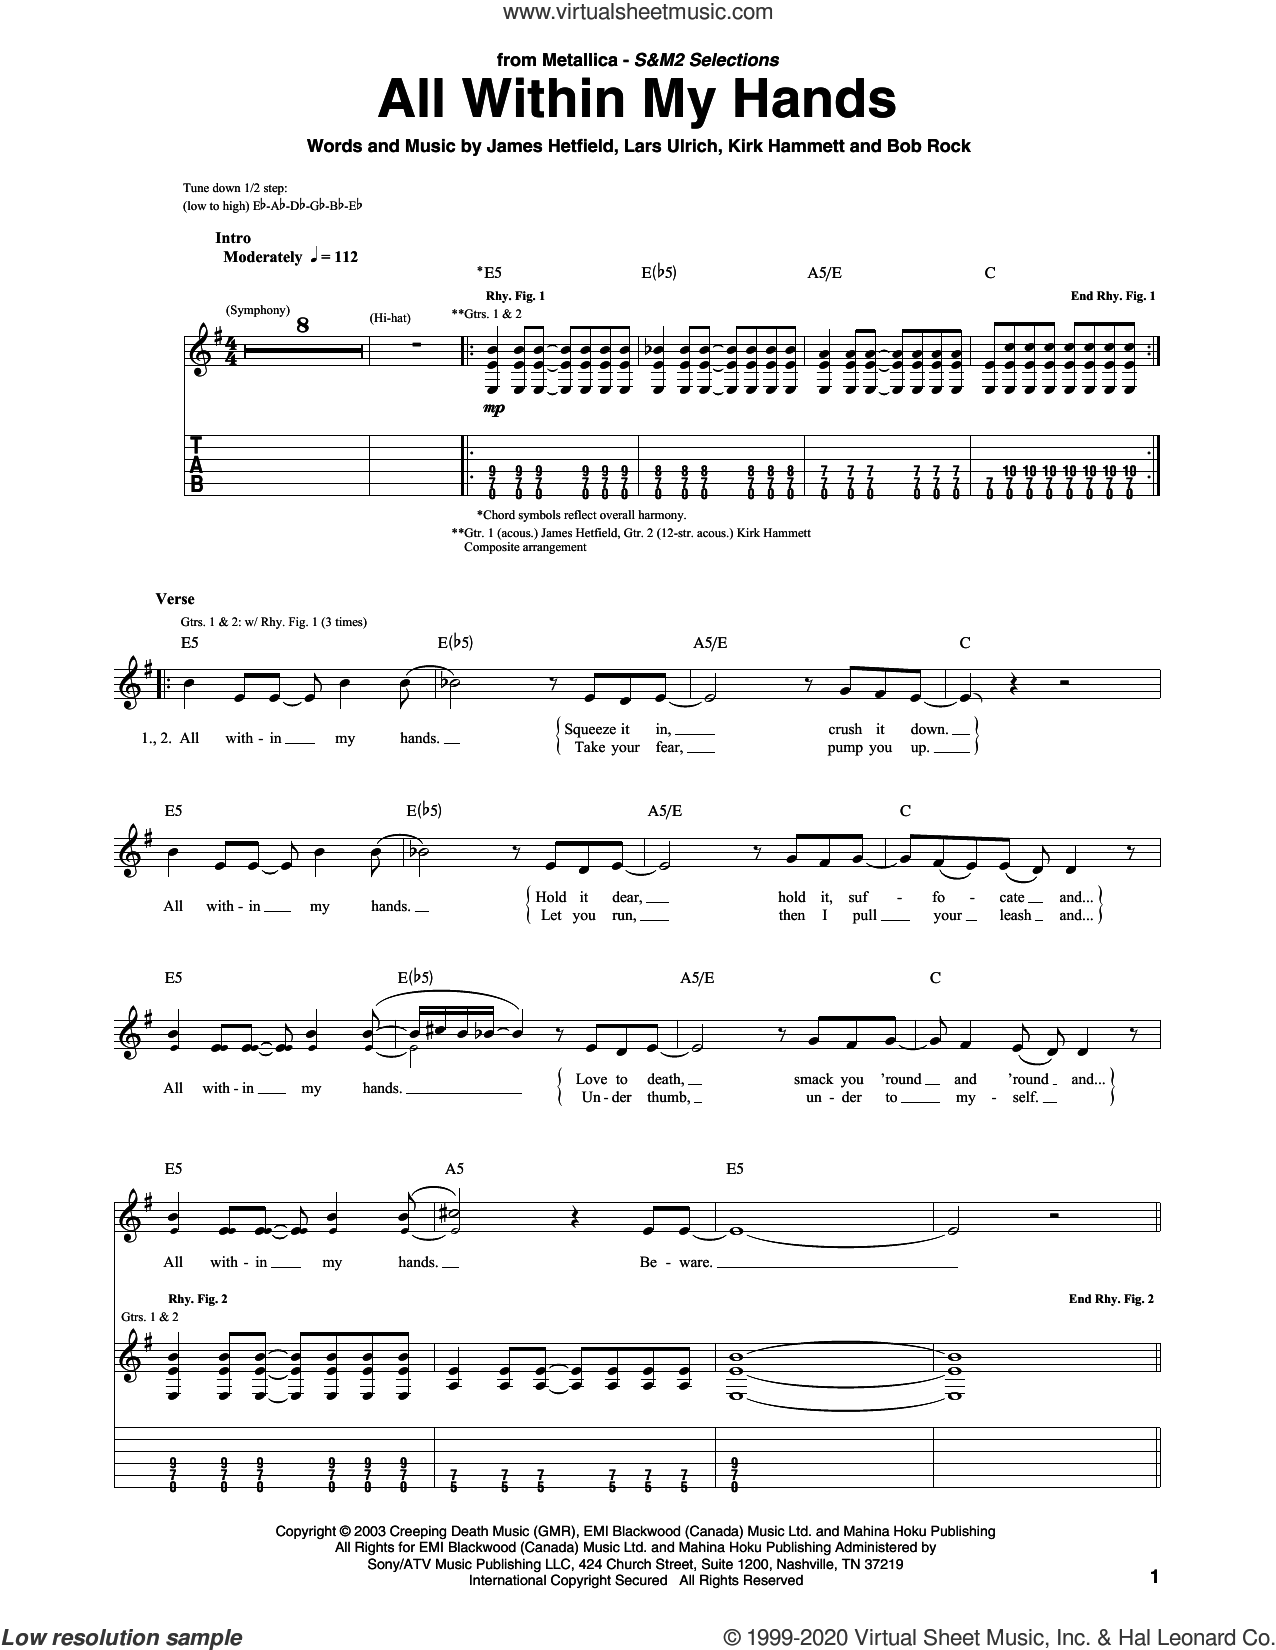 All Within My Hands sheet music for guitar (tablature) by Metallica, Bob Rock, James Hetfield, Kirk Hammett and Lars Ulrich, intermediate skill level